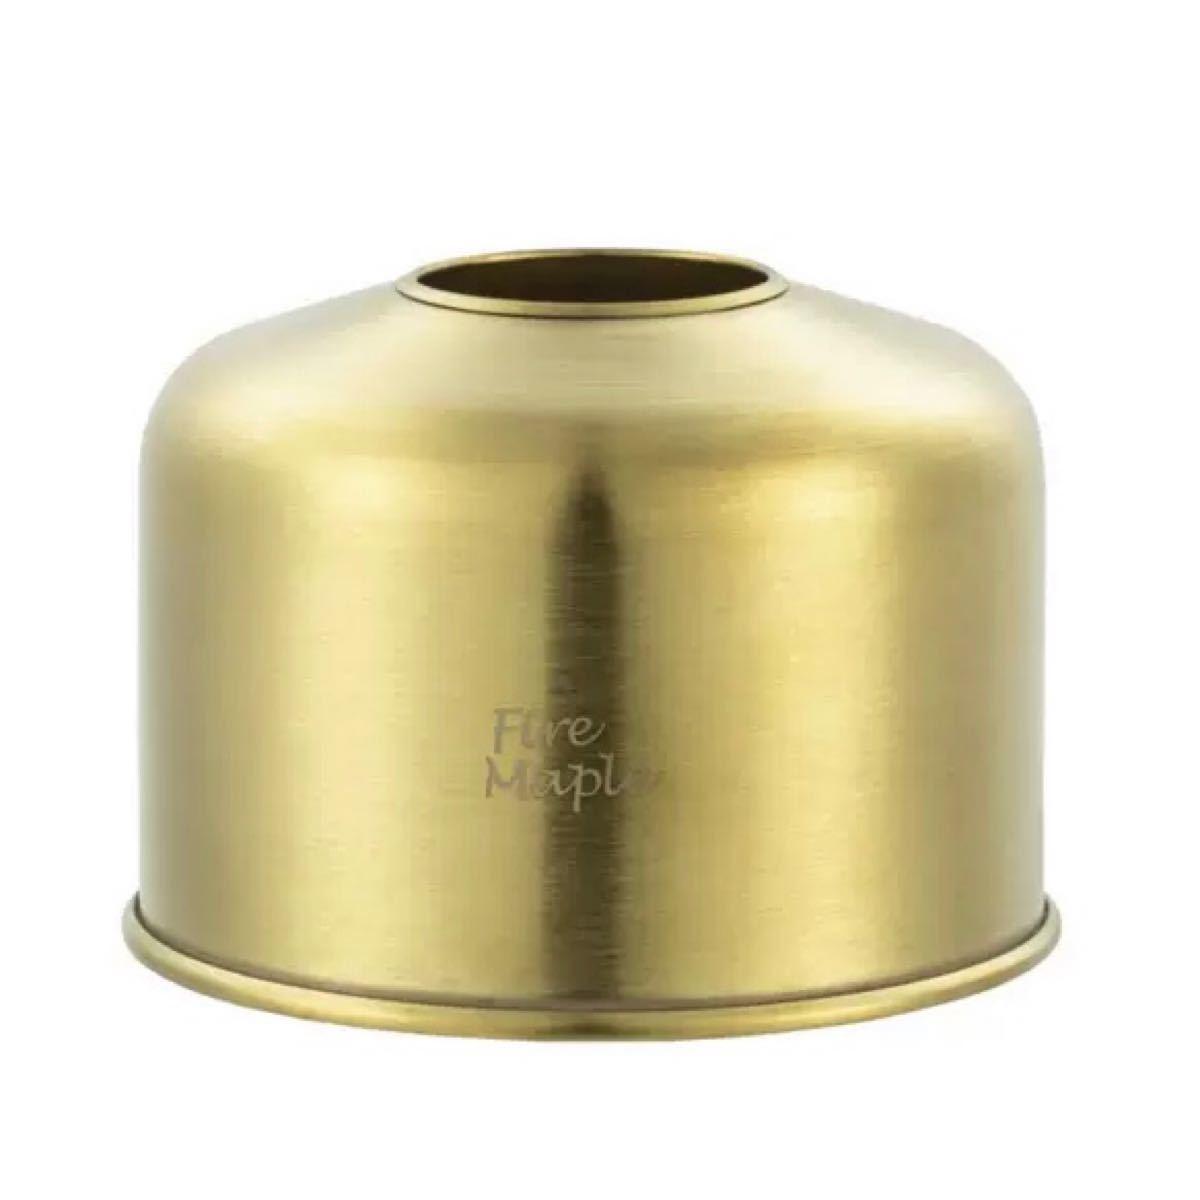 OD缶カバー ゴールド 230用 ステンレス 金属 真鍮 おしゃれ シンプル